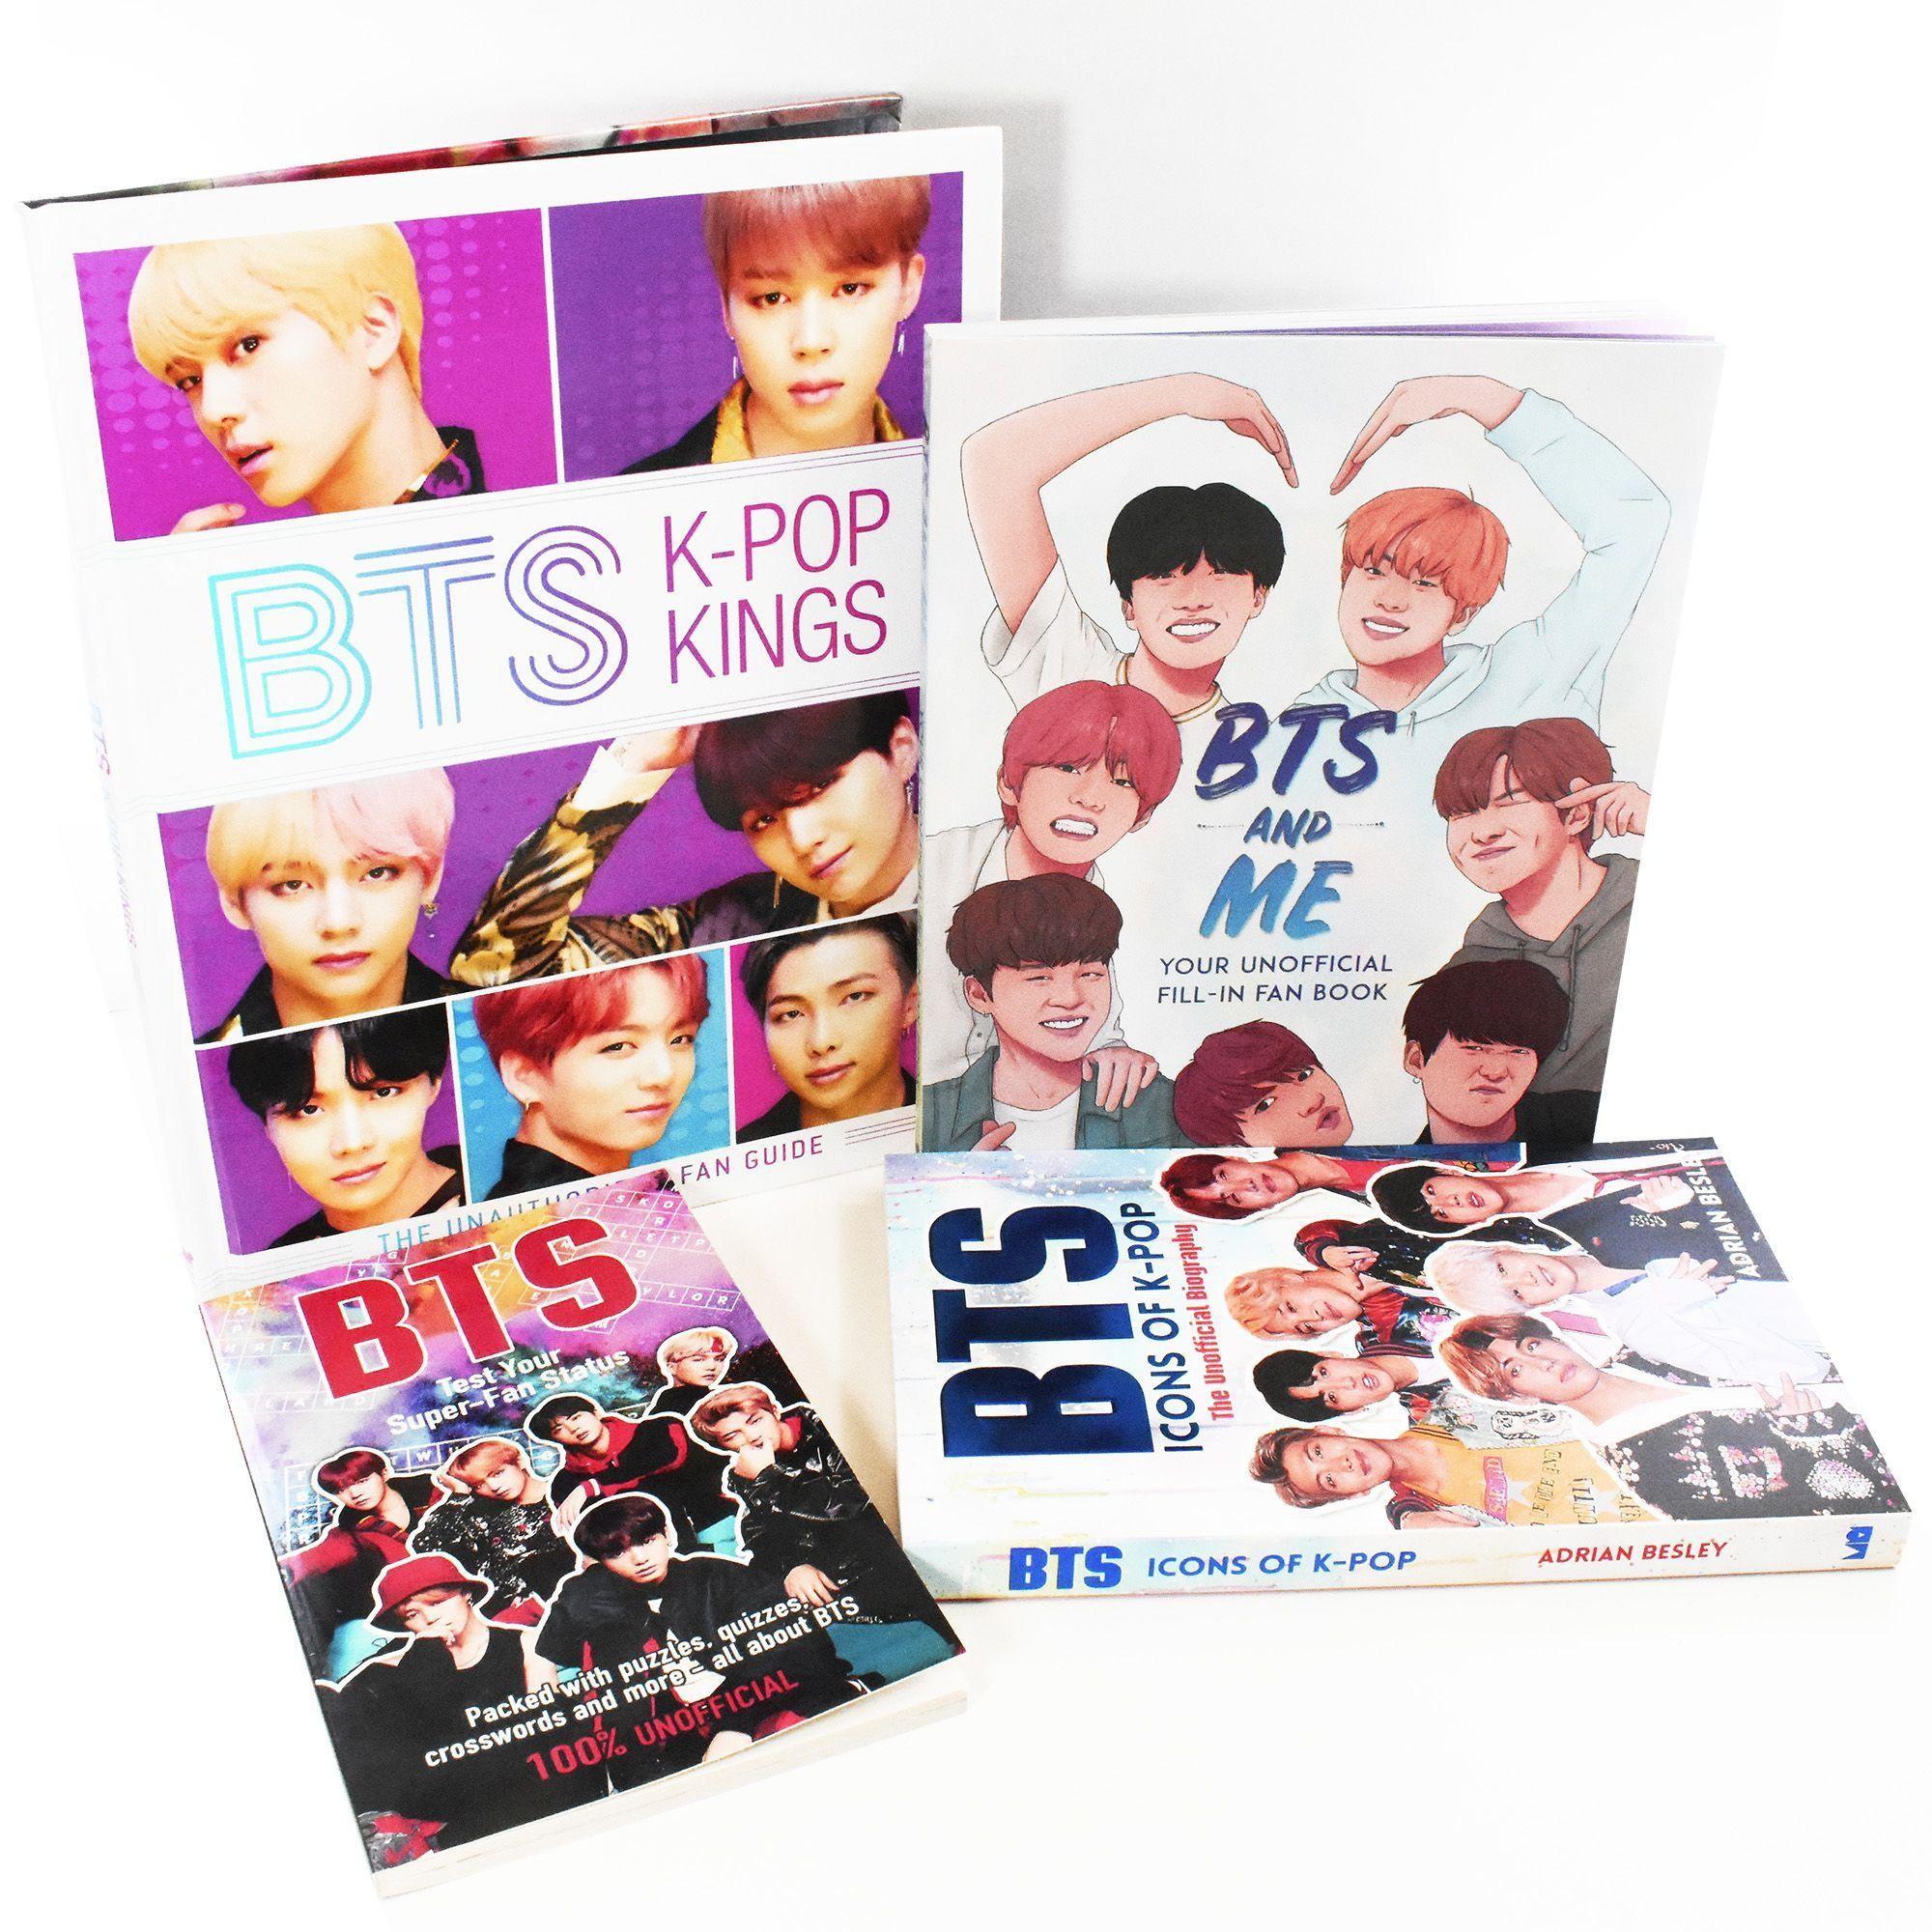 BTS Kings & Icons of K-Pop 4 Books Set £8.50 @ Books2Door (Free P&P Using Code)